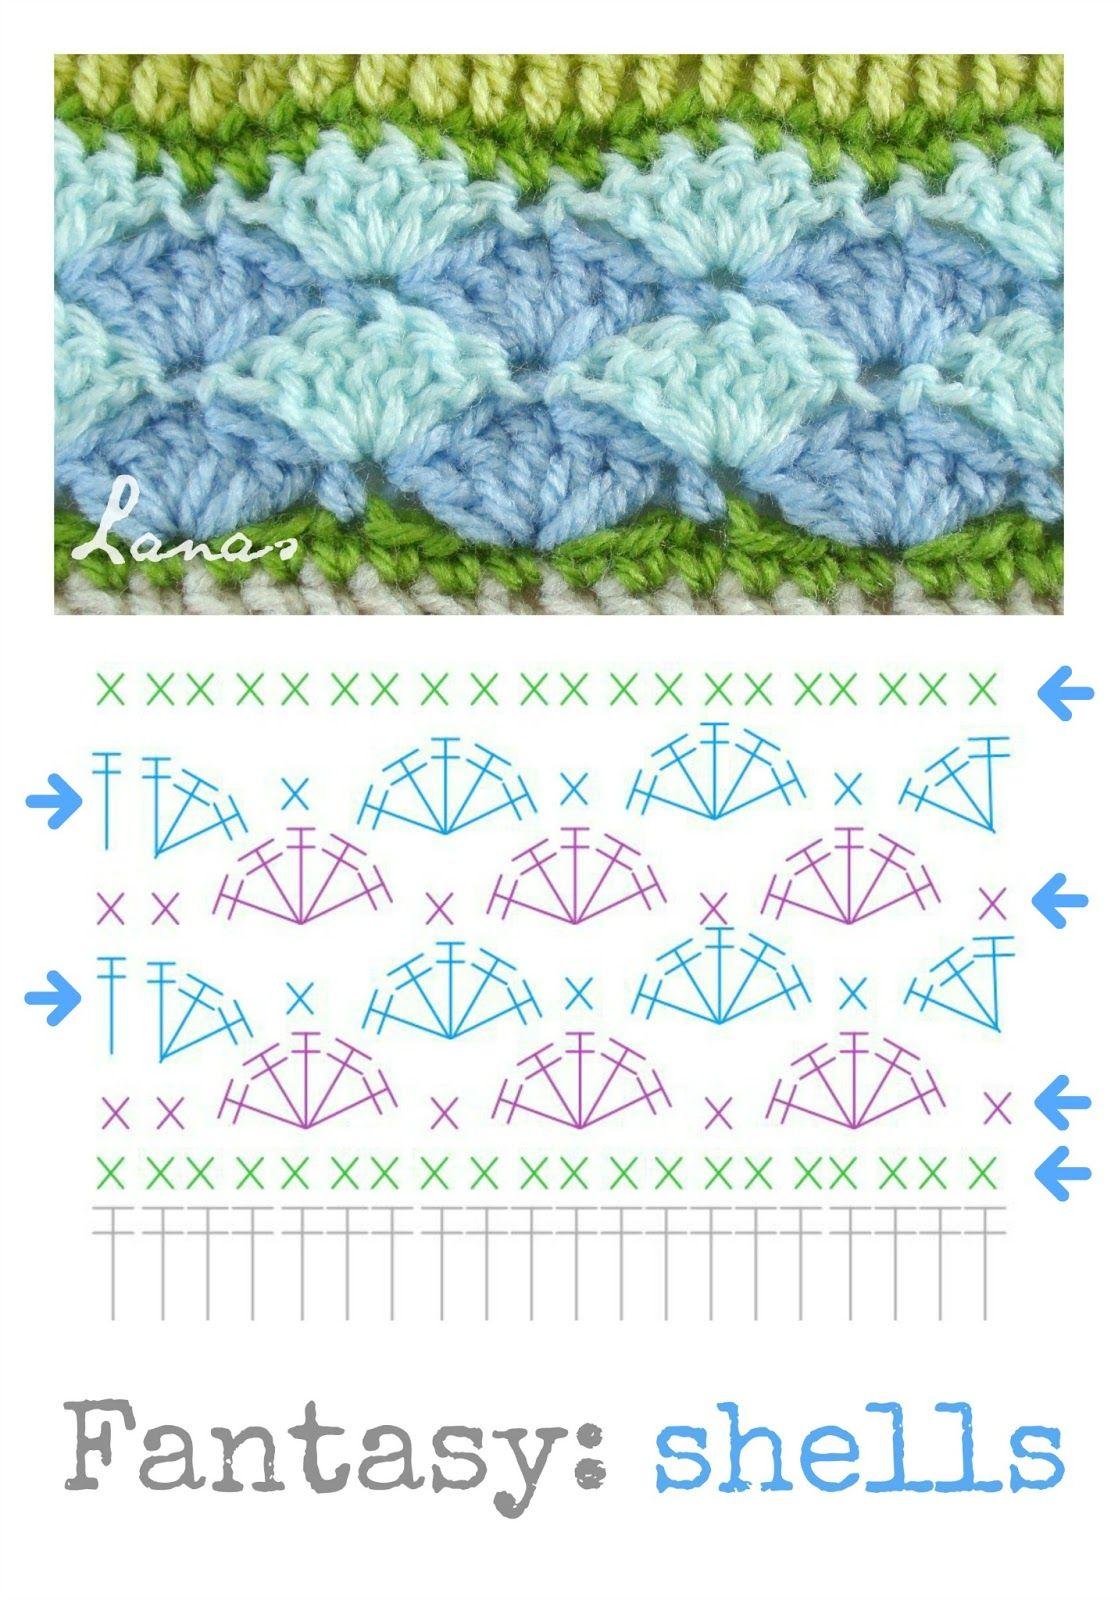 Pin By Debby Fritz On Crafts Pinterest Crochet Stitches Chevron Pattern Diagram Mantas Motif With Chart Blanket Different Patterns Fantasy Manta Shells Teresa Restegui Http